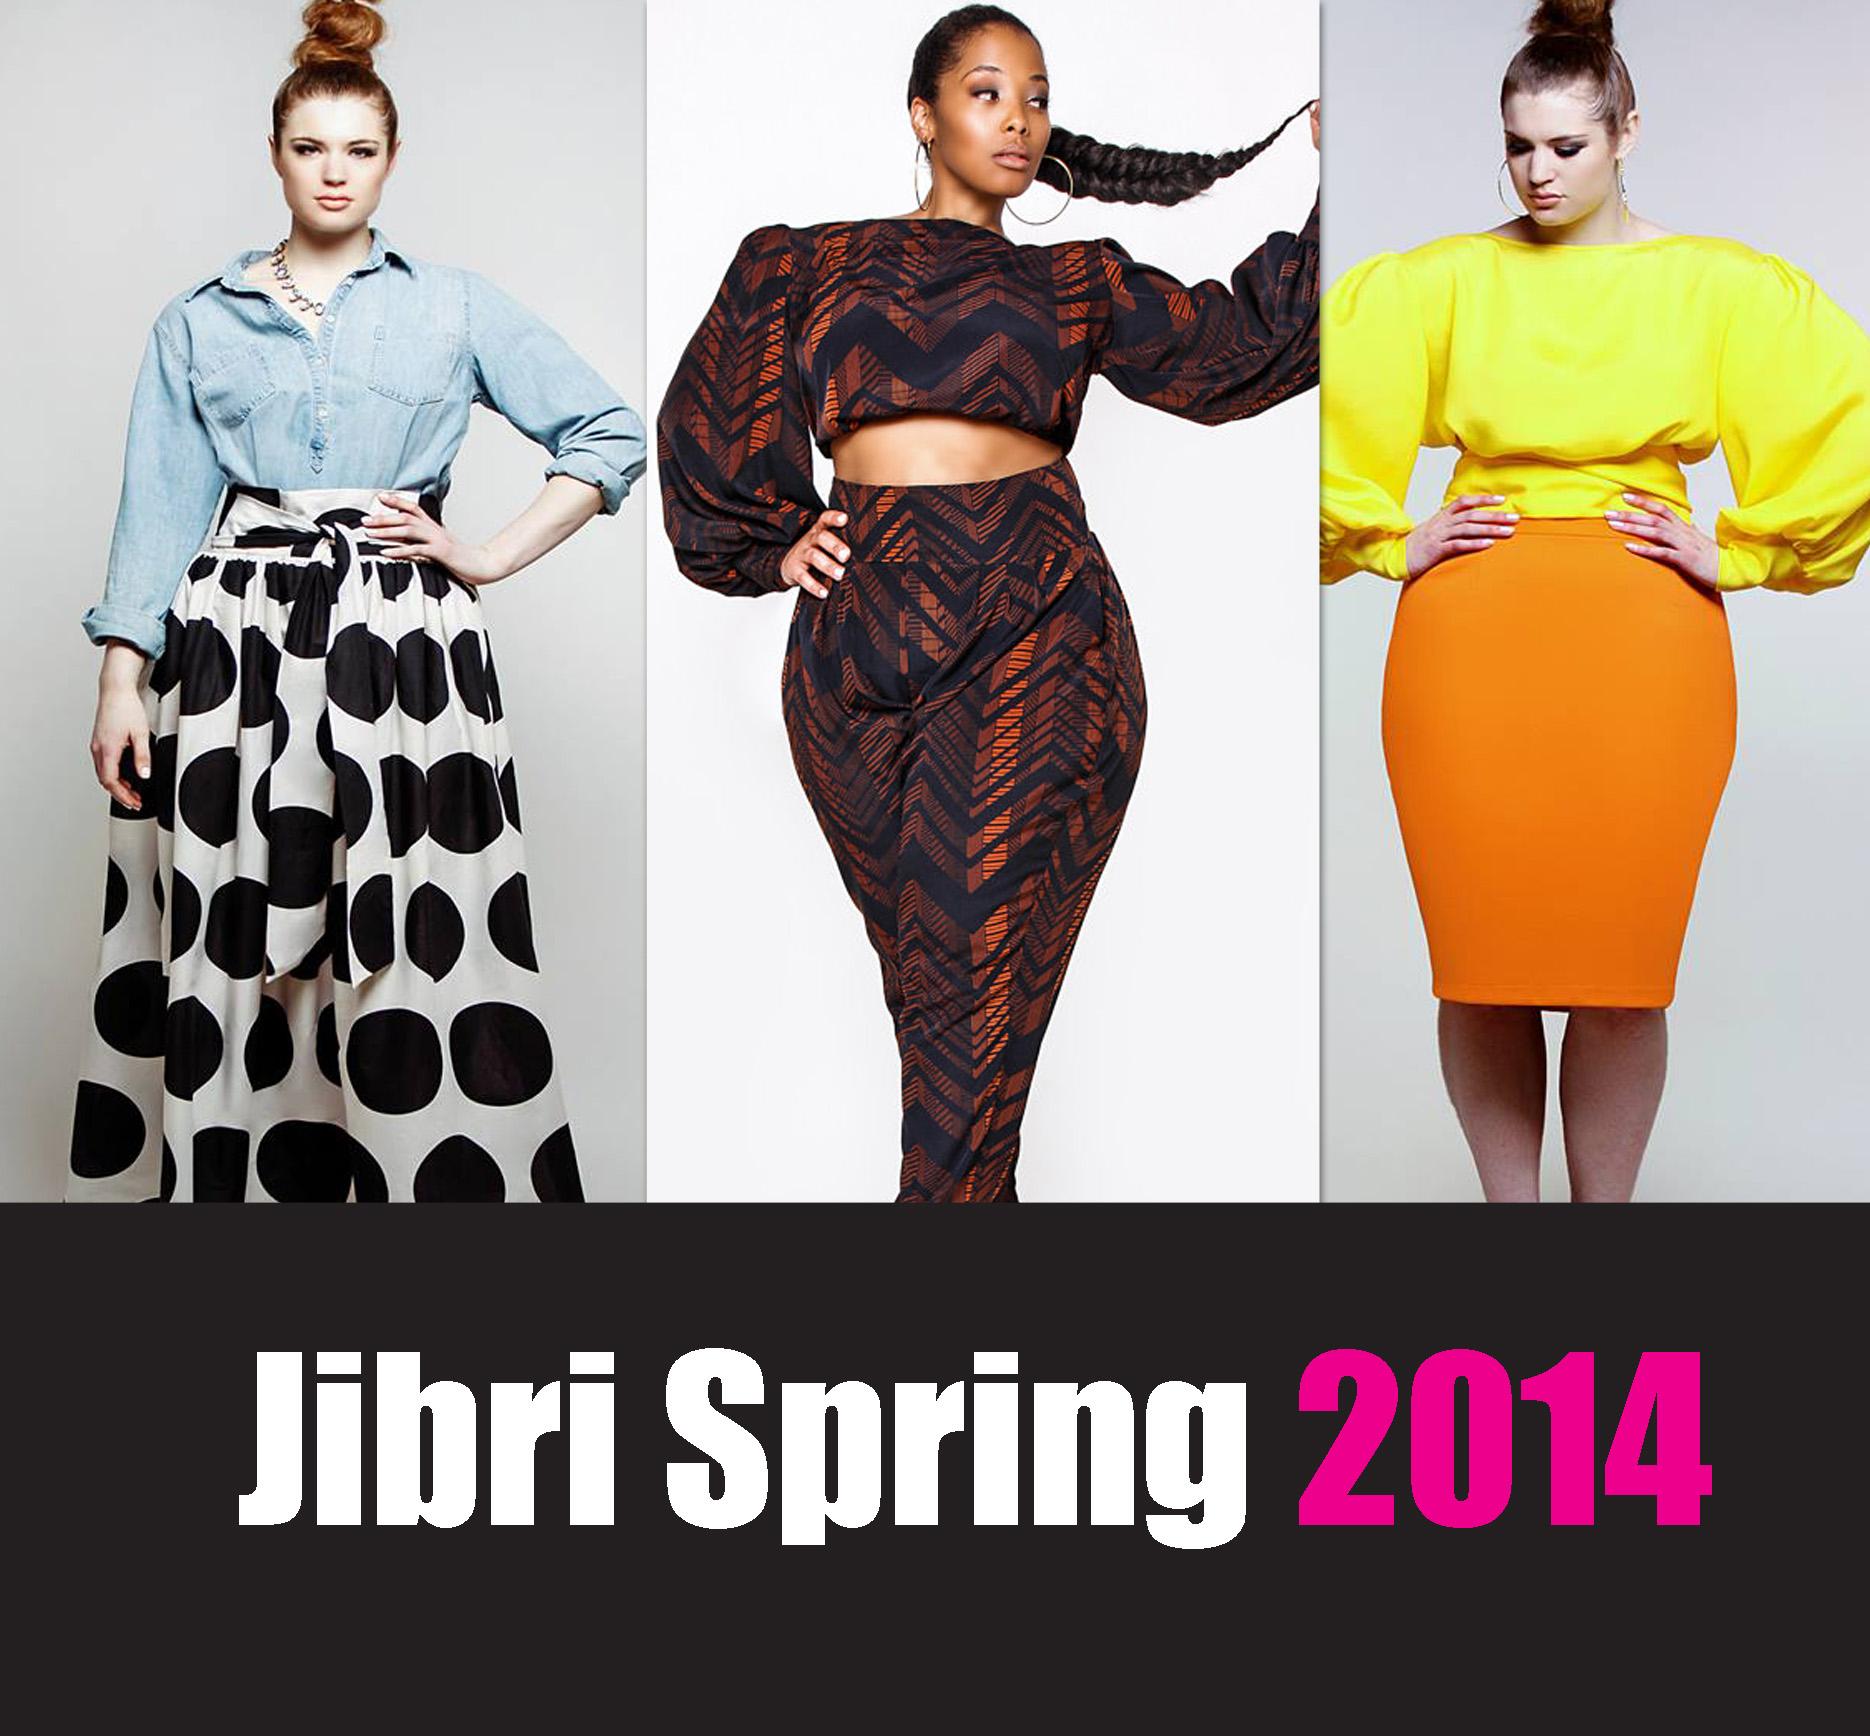 plus size designer jibri unveils her spring 2014 collection